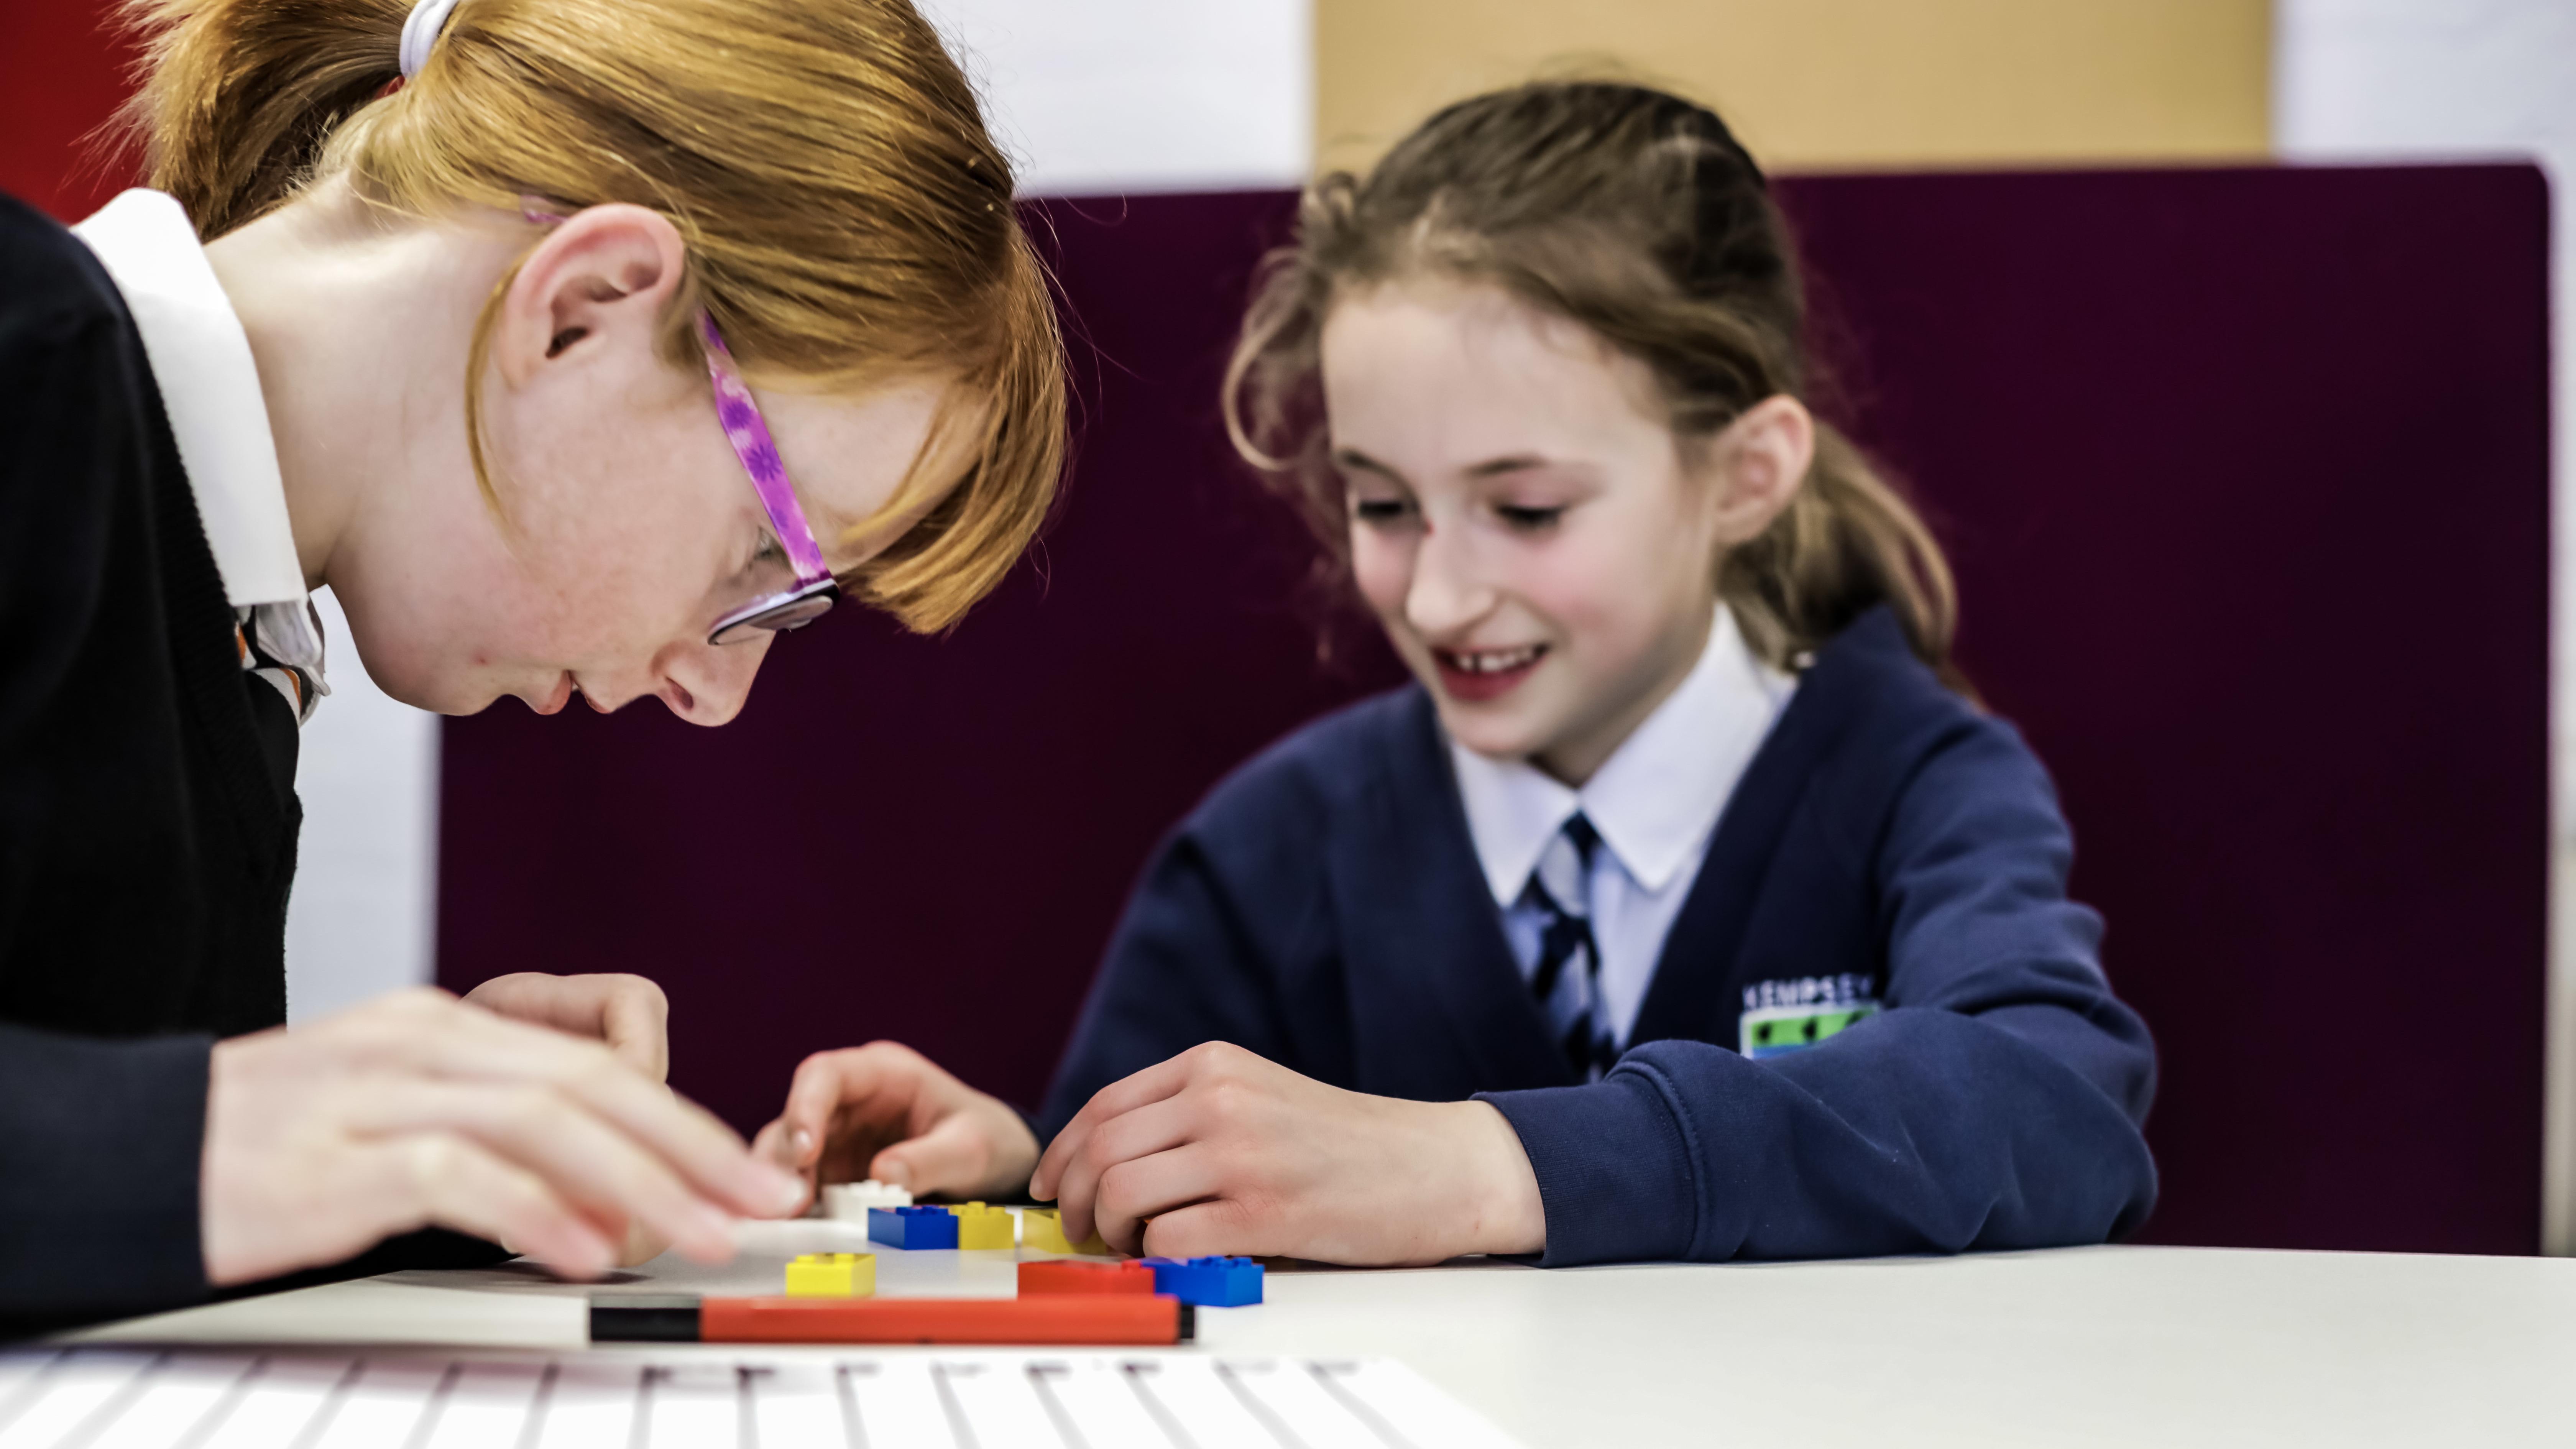 To Help Children Learn Braille Lego Will Introduce Bricks Designed